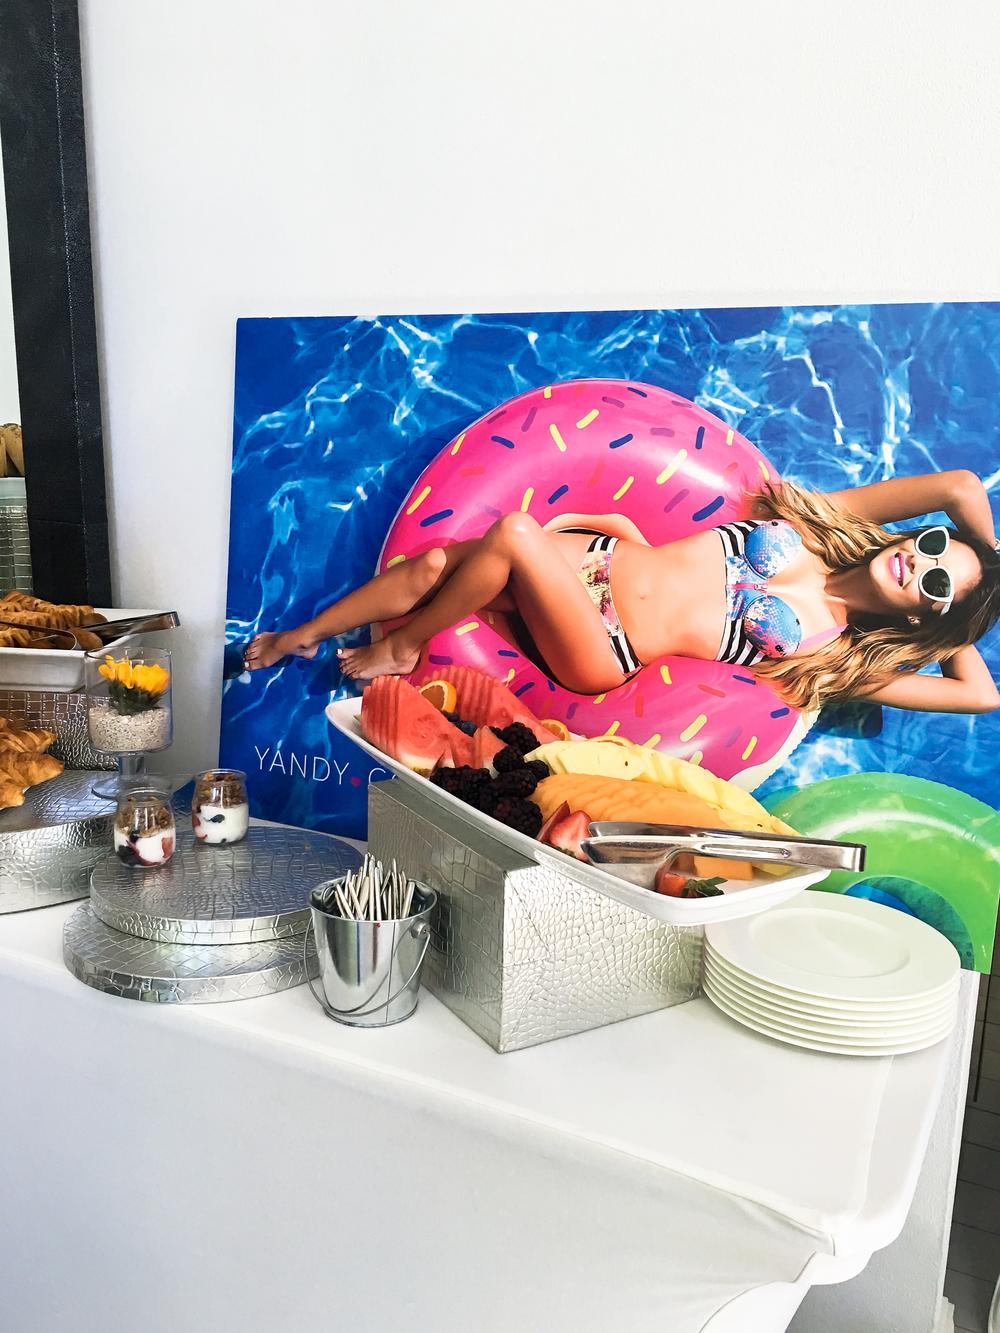 Yandy Miami Swim Week By Lisa Linh Lisa Linh